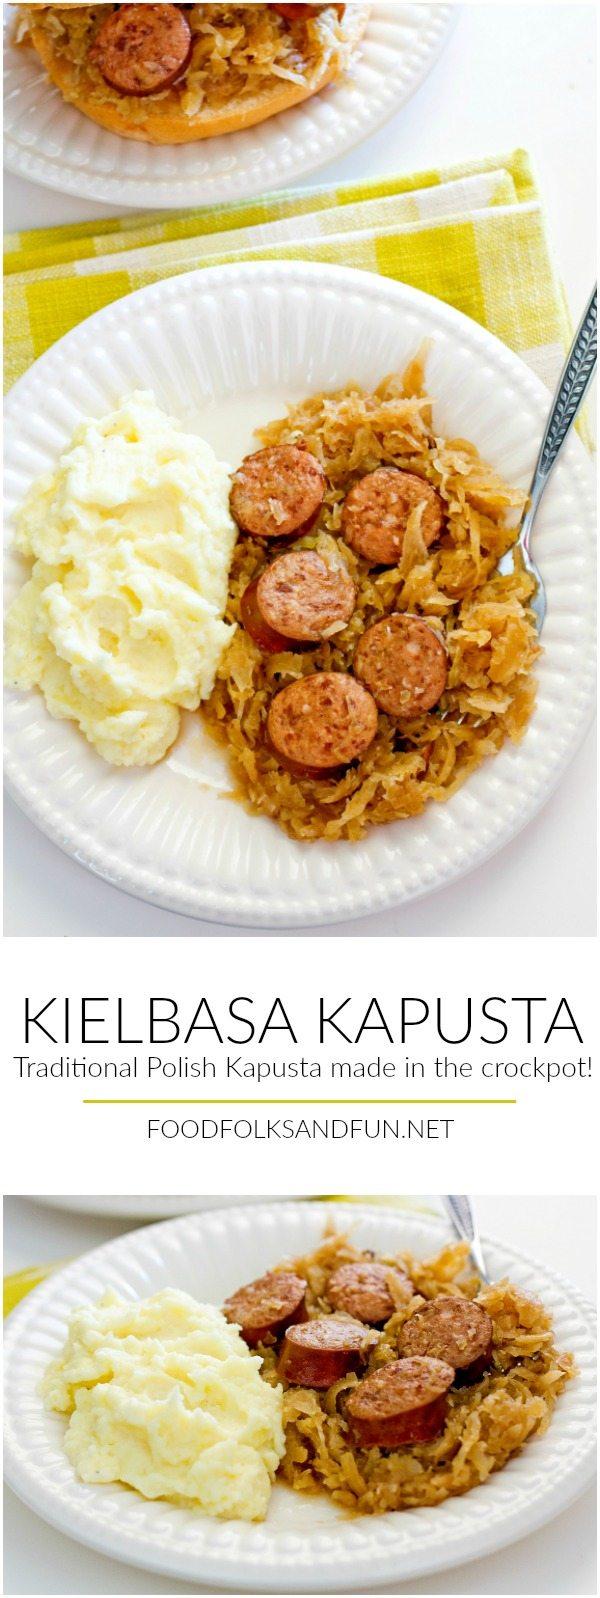 This recipe for Kielbasa Kapusta is my family's traditional Polish Kapusta recipe made in a slow cooker!